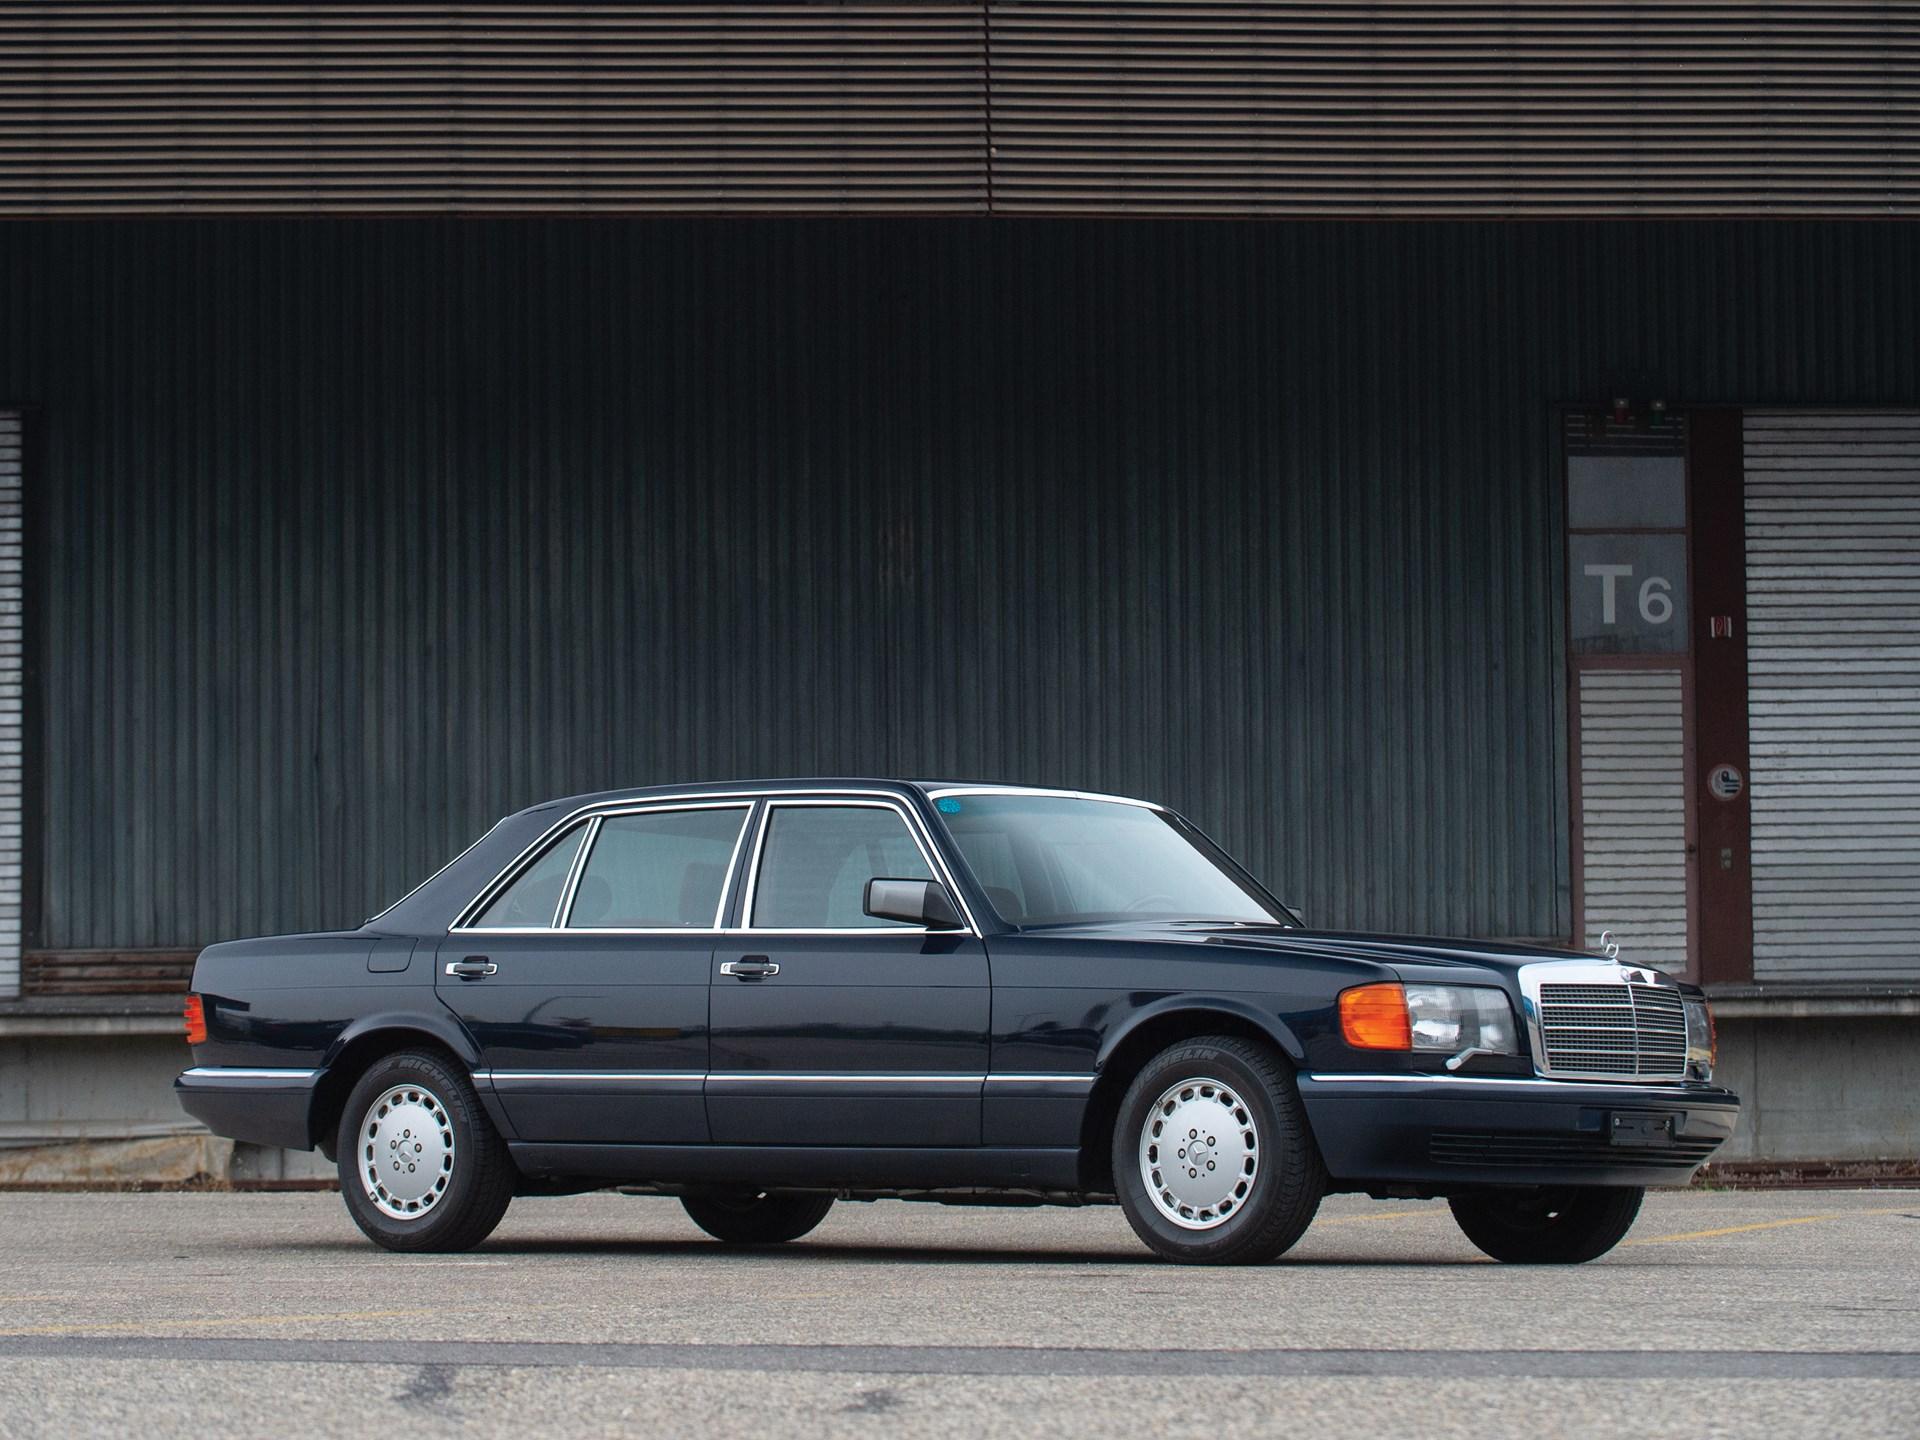 RM Sotheby's - 1989 Mercedes-Benz 560 SEL | Essen 2019